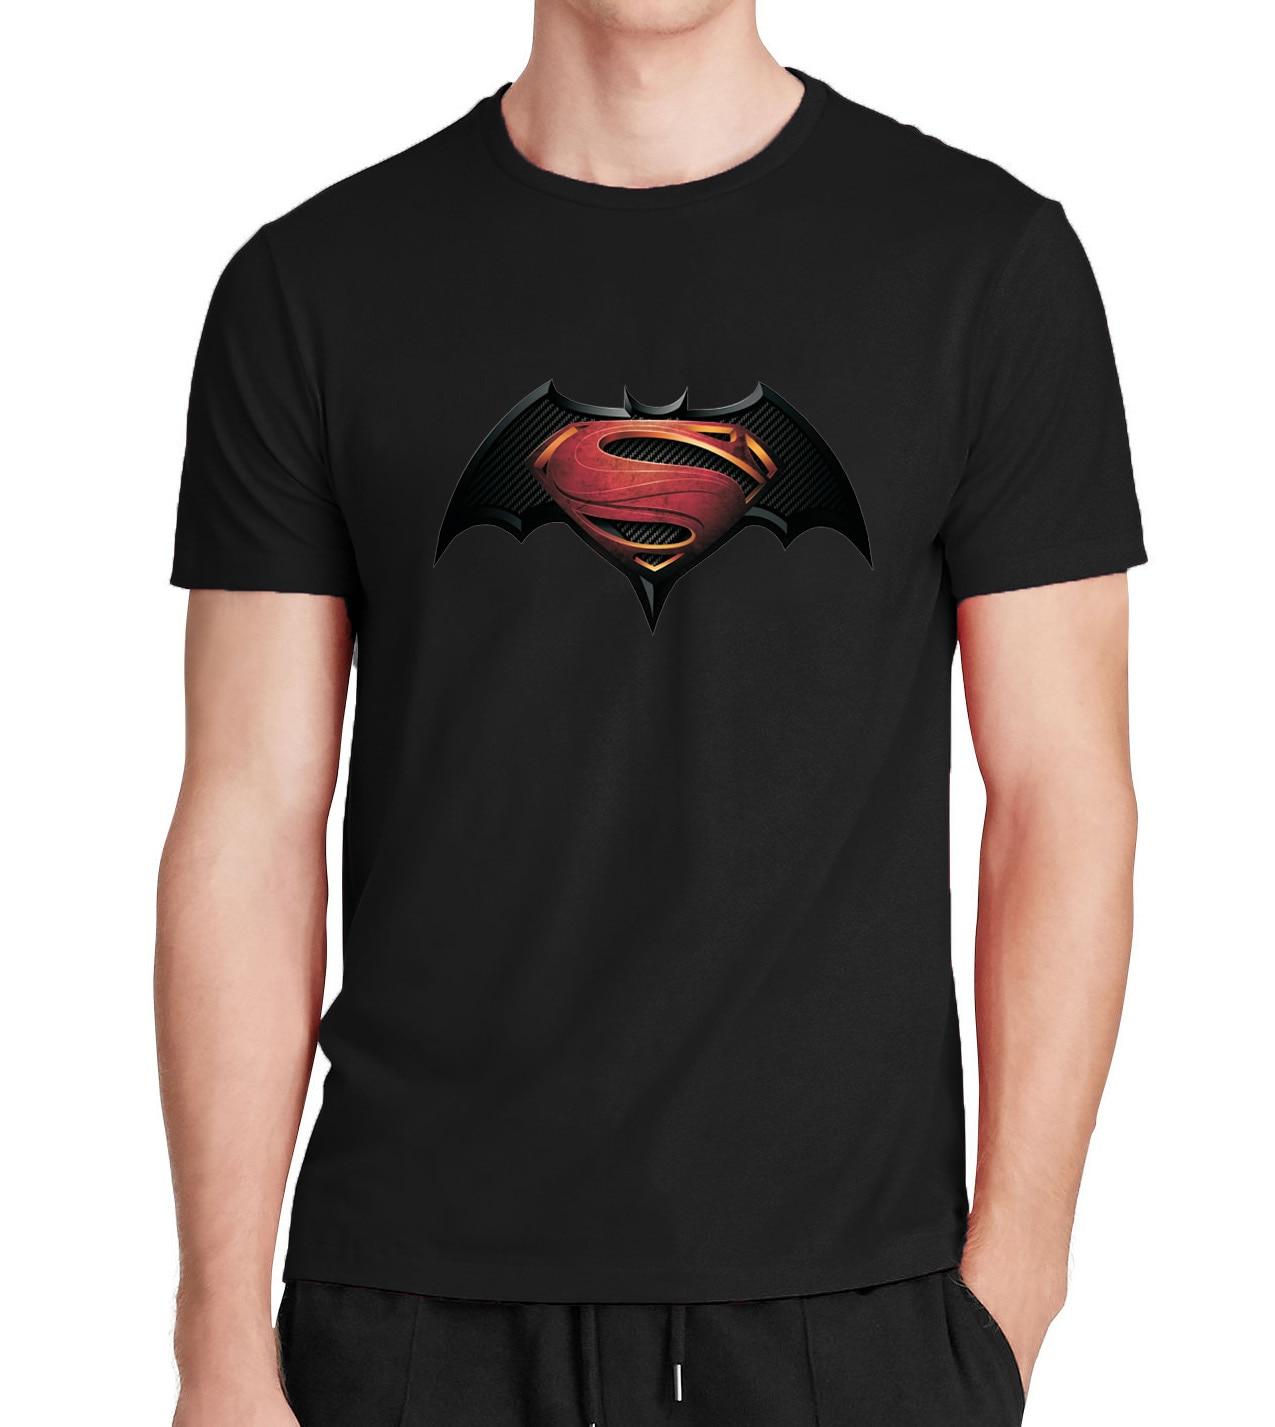 Batman Marvel Superman hero men 39 s Brand clothing tshirt Summer 100 cotton Fitness Bodybuilding shirt black retro t shirt Tops in T Shirts from Men 39 s Clothing